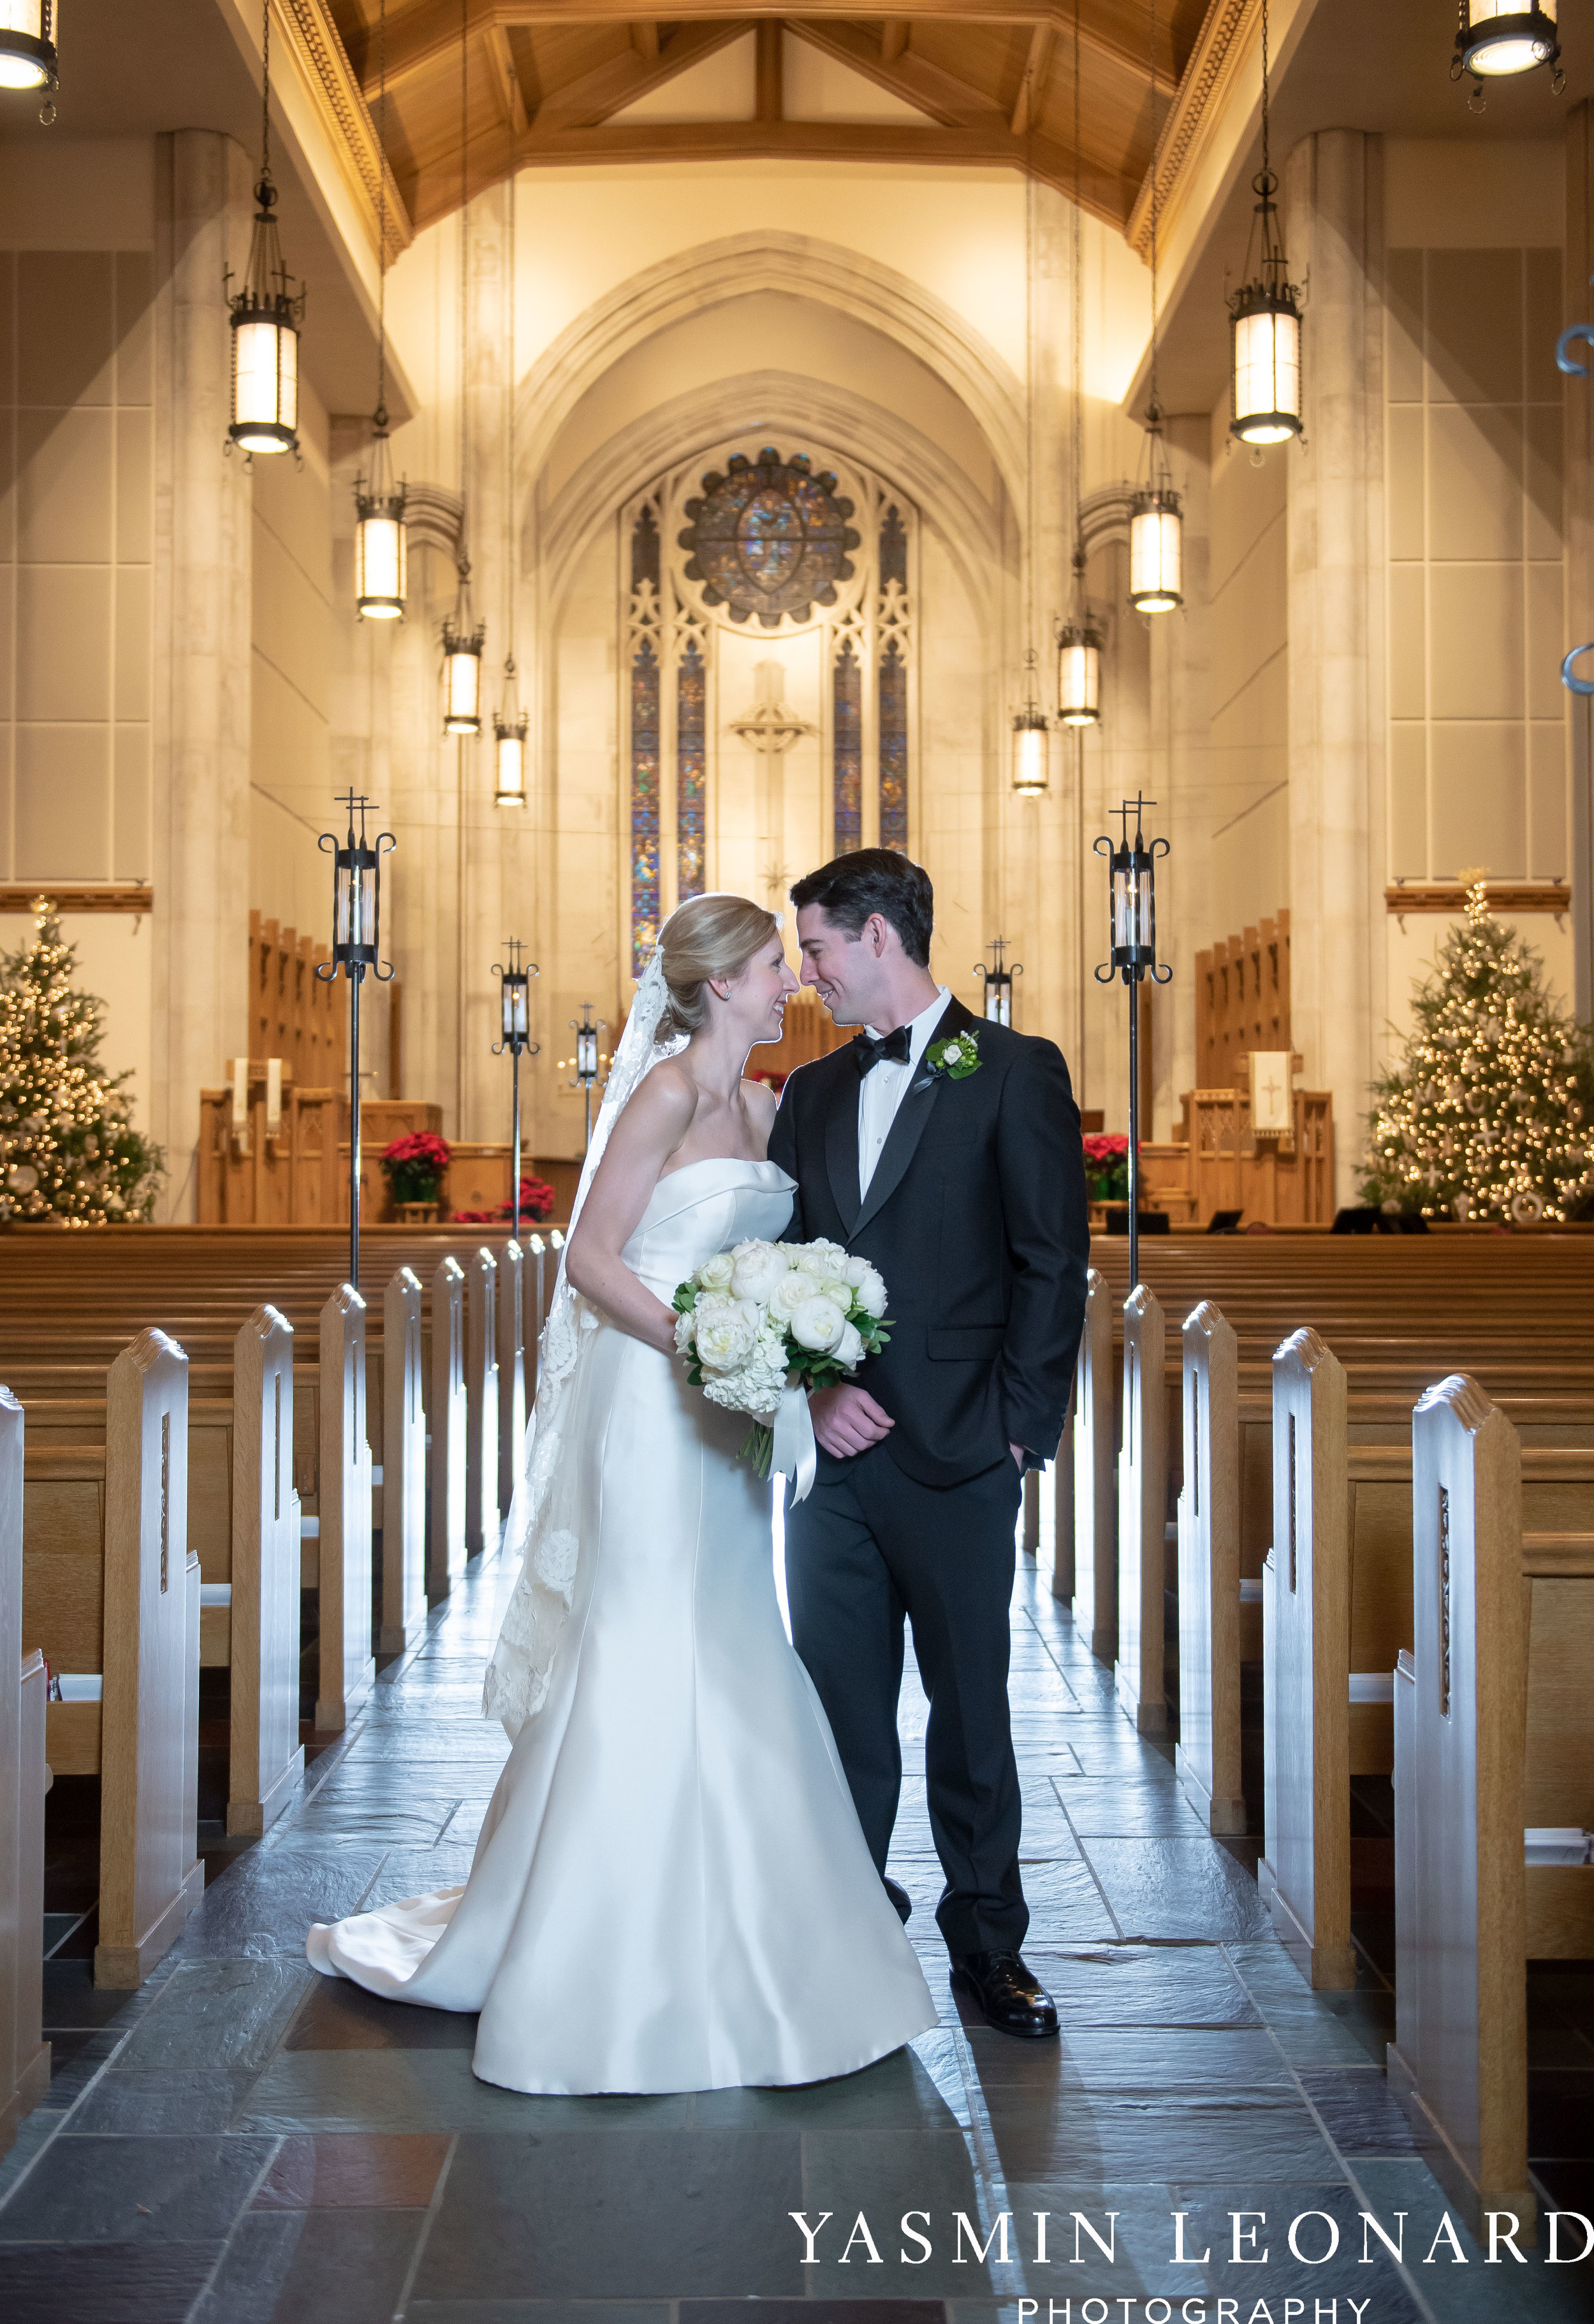 Wesley Memorial UMC - High Point Country Club - Emerywood Country Club - High Point Weddings - High Point Wedding Photographer - Yasmin Leonard Photography-21.jpg